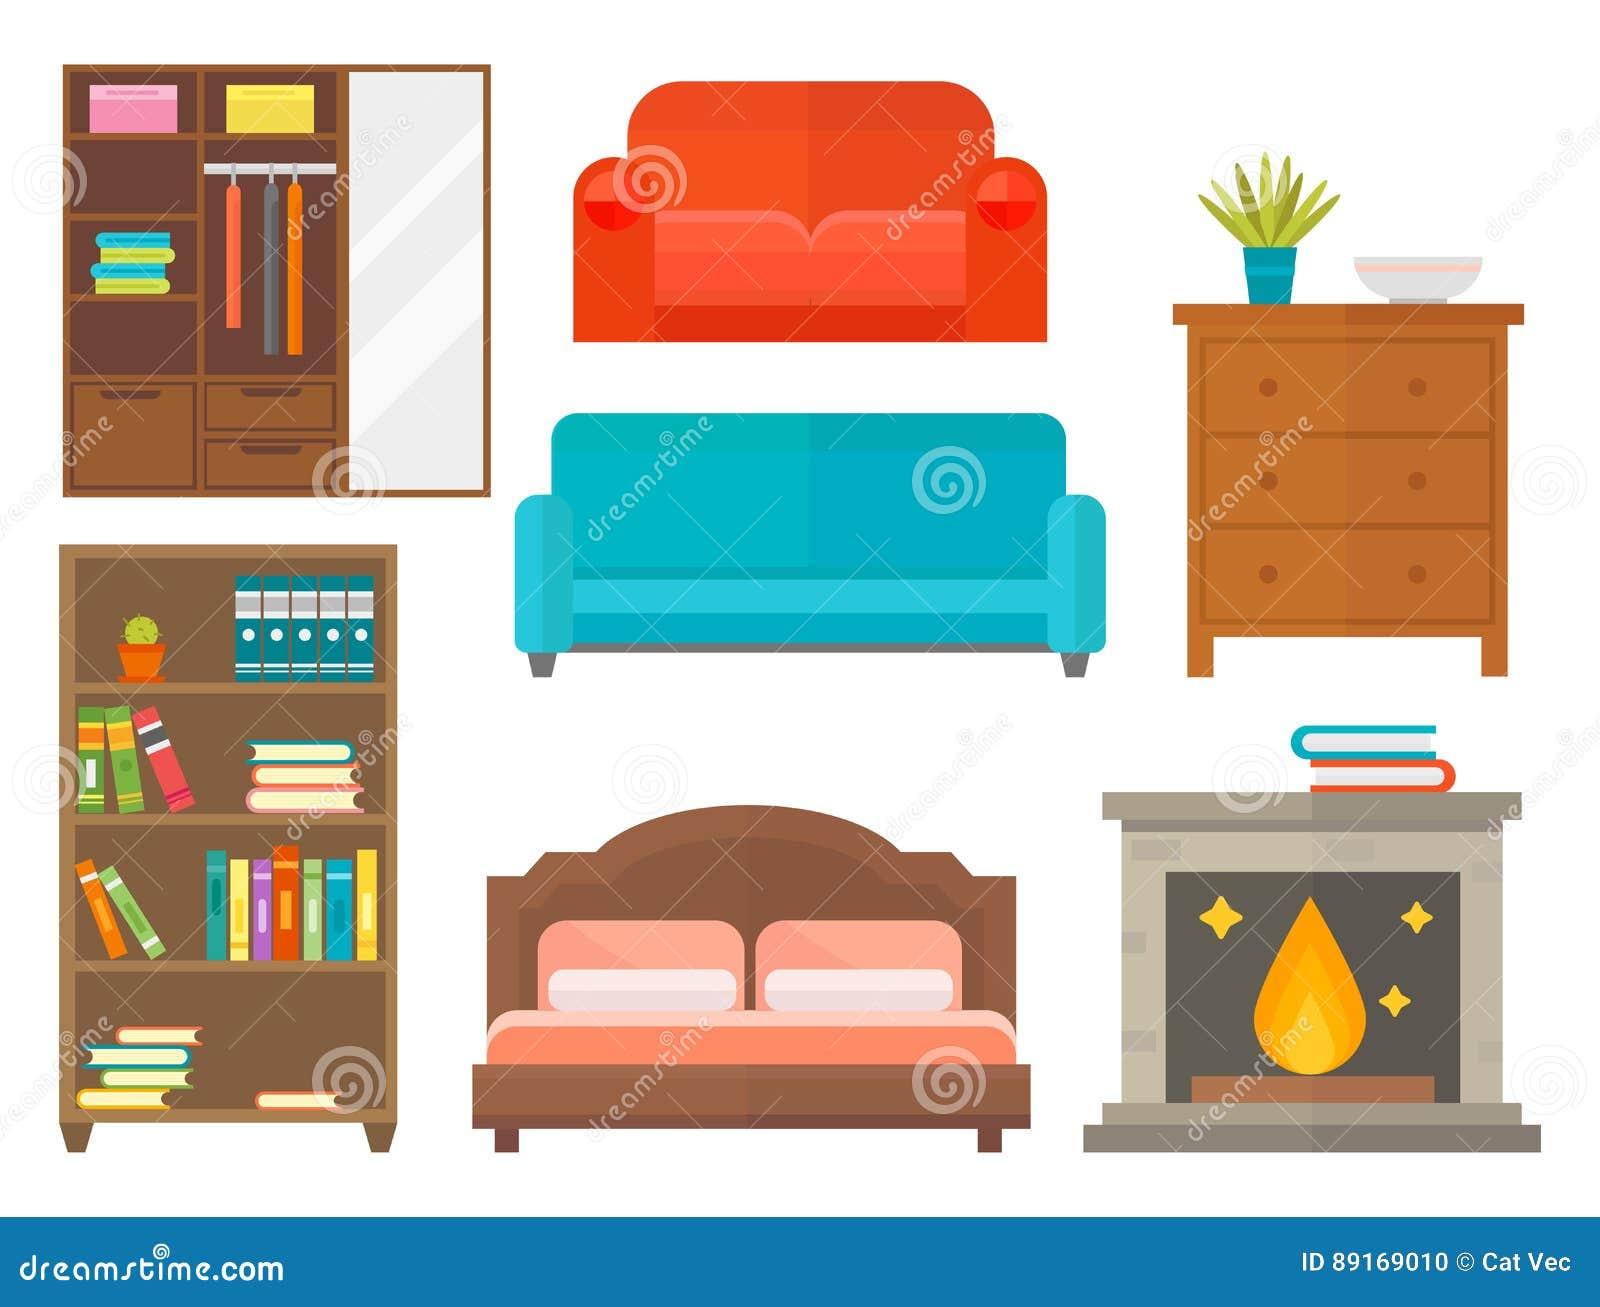 Furniture Home Decor Icon Set Indoor Cabinet Interior Room Library